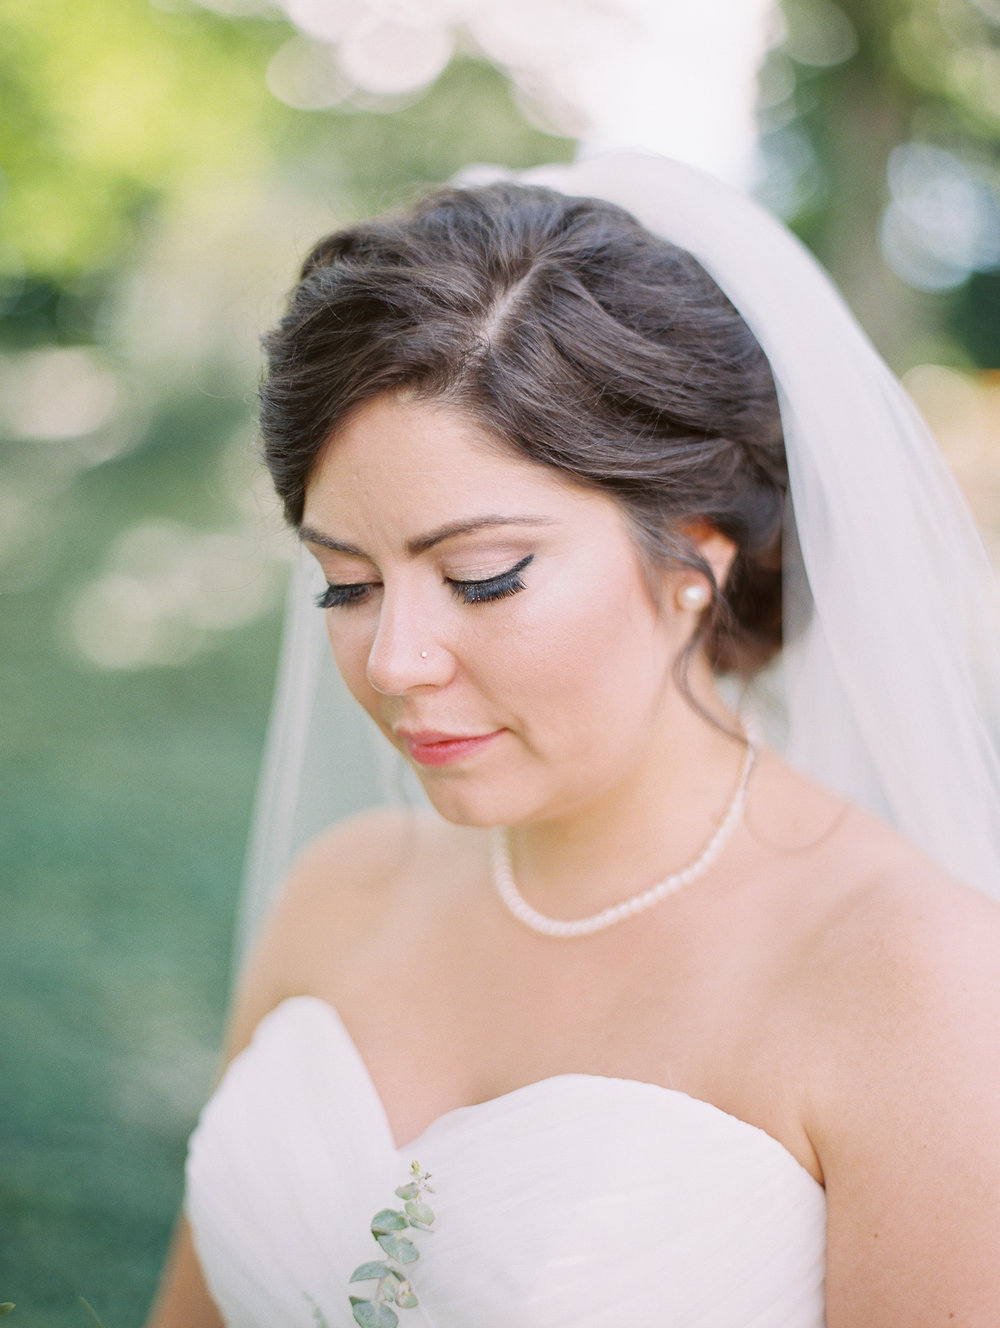 Sobania Wedding Bride Groom f ASP©-3.jpg